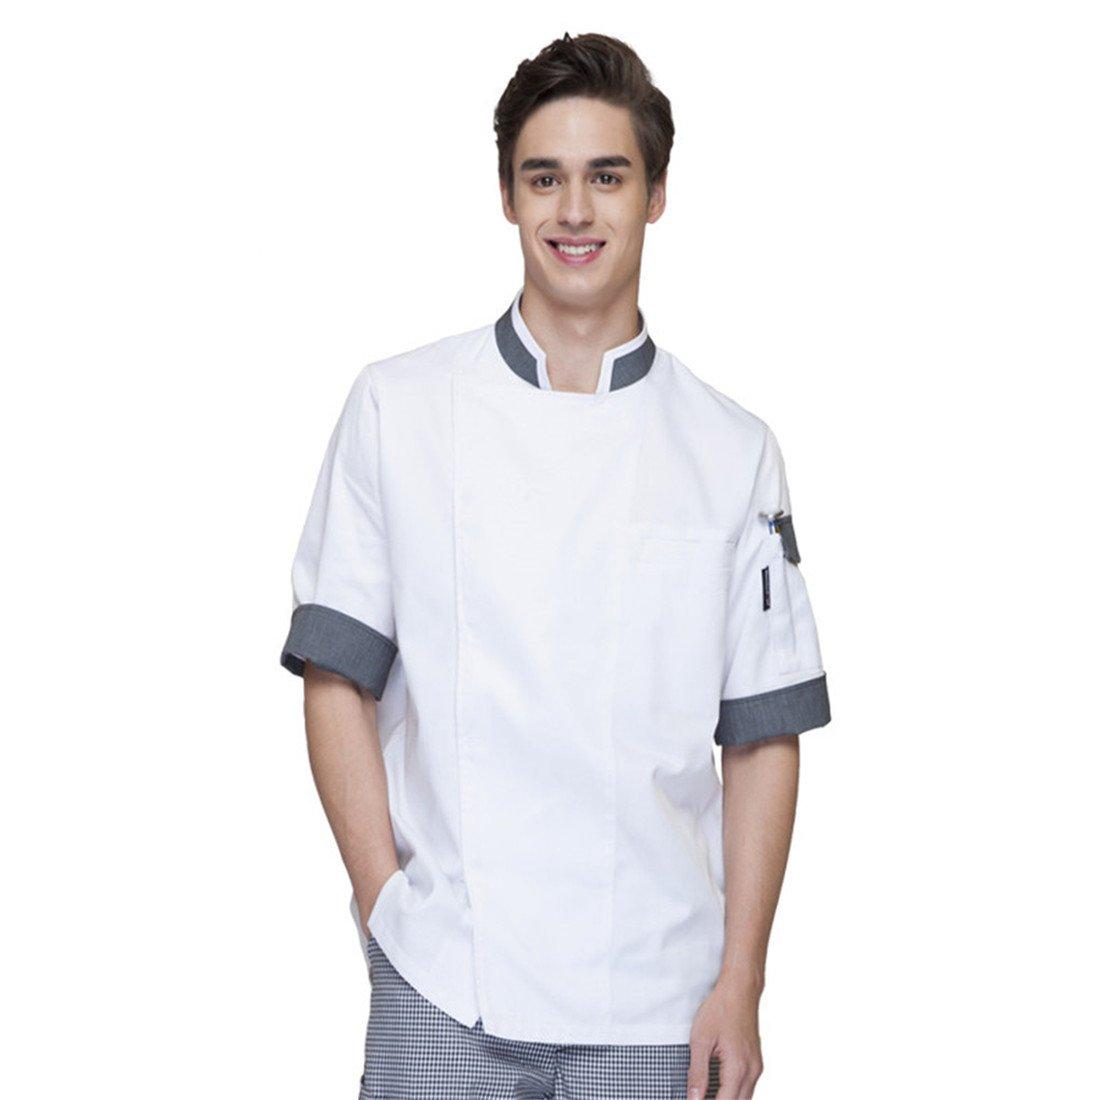 Cheflife Men's White Unisex Chef Uniforms Short Sleeve Chef Coat US:M/Tag:XL